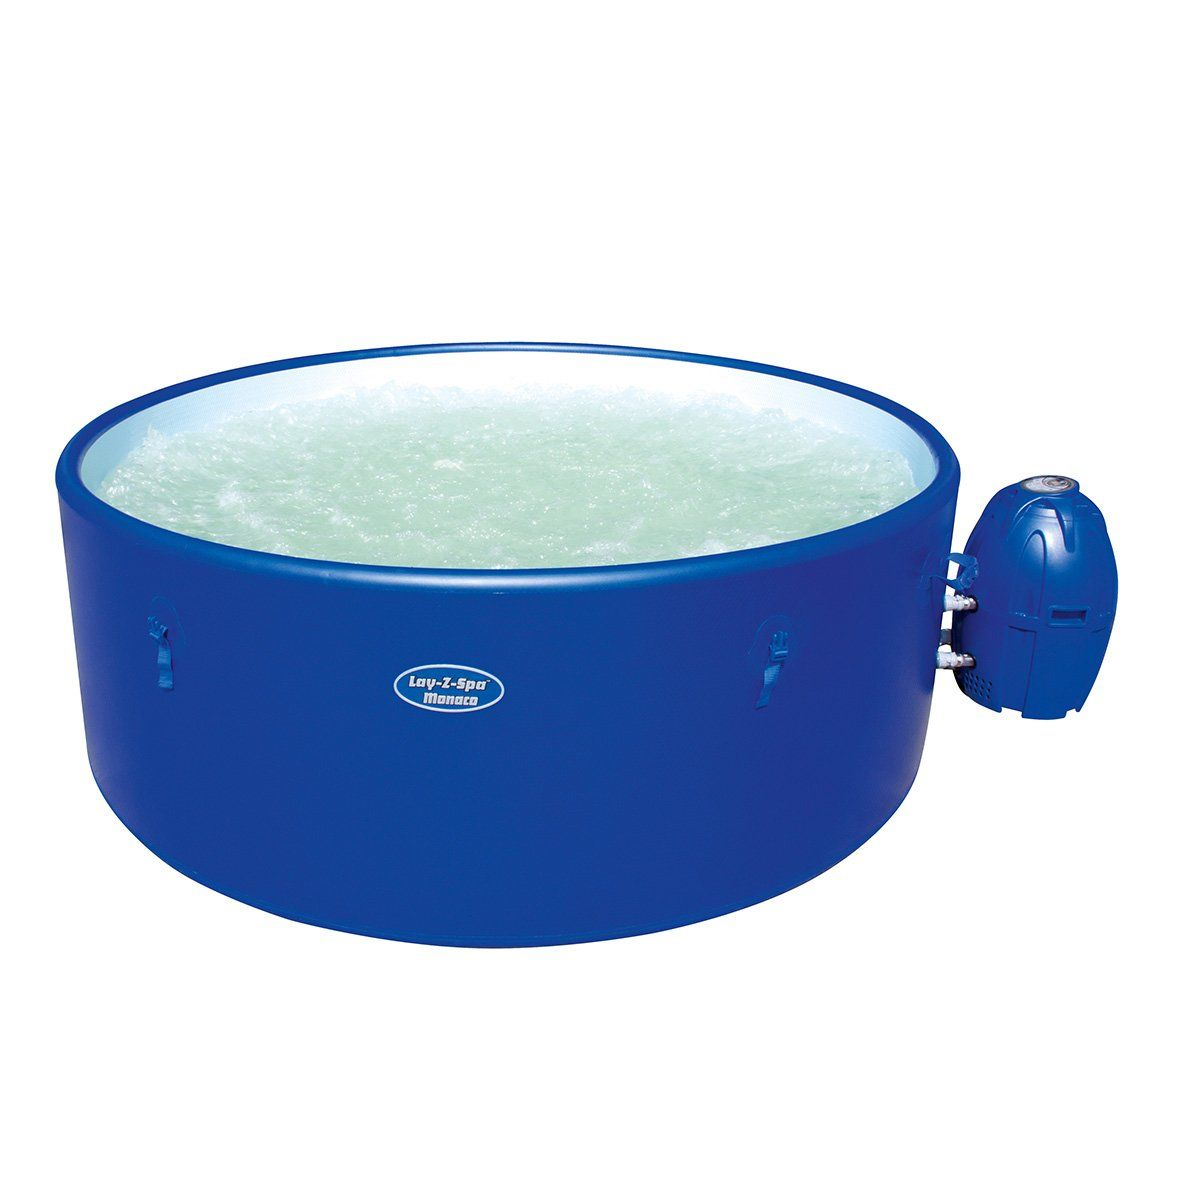 Lay Z Spa Monaco Inflatable Hot Tub 6 8 Persons Bw54113 Amazon